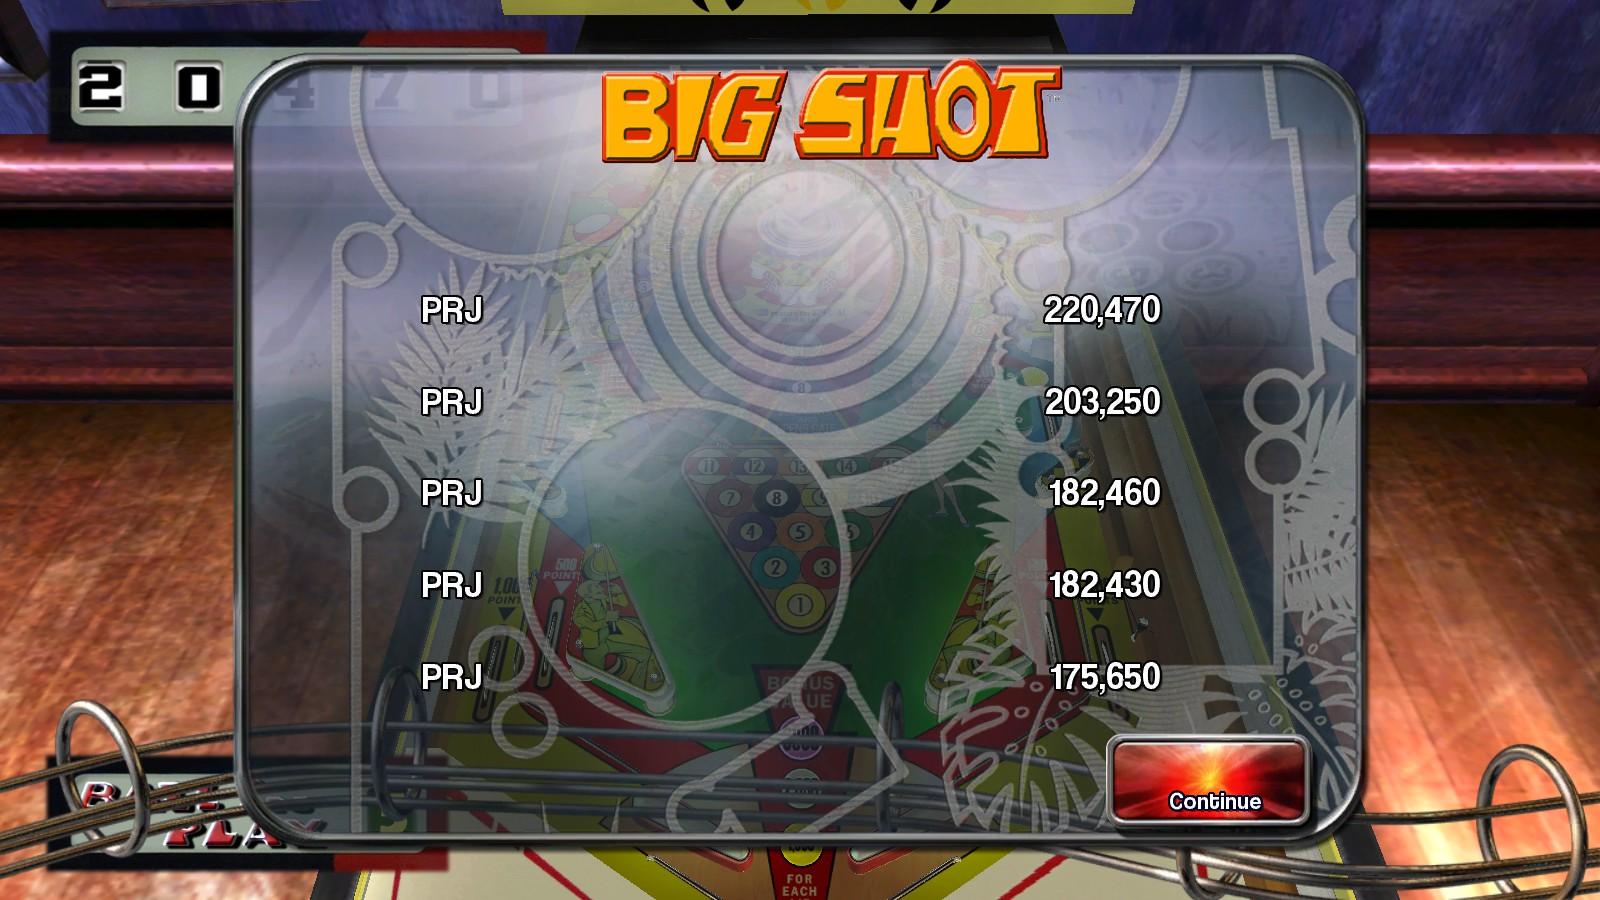 Deteacher: Pinball Arcade: Big Shot (PC) 220,470 points on 2015-08-30 19:29:21